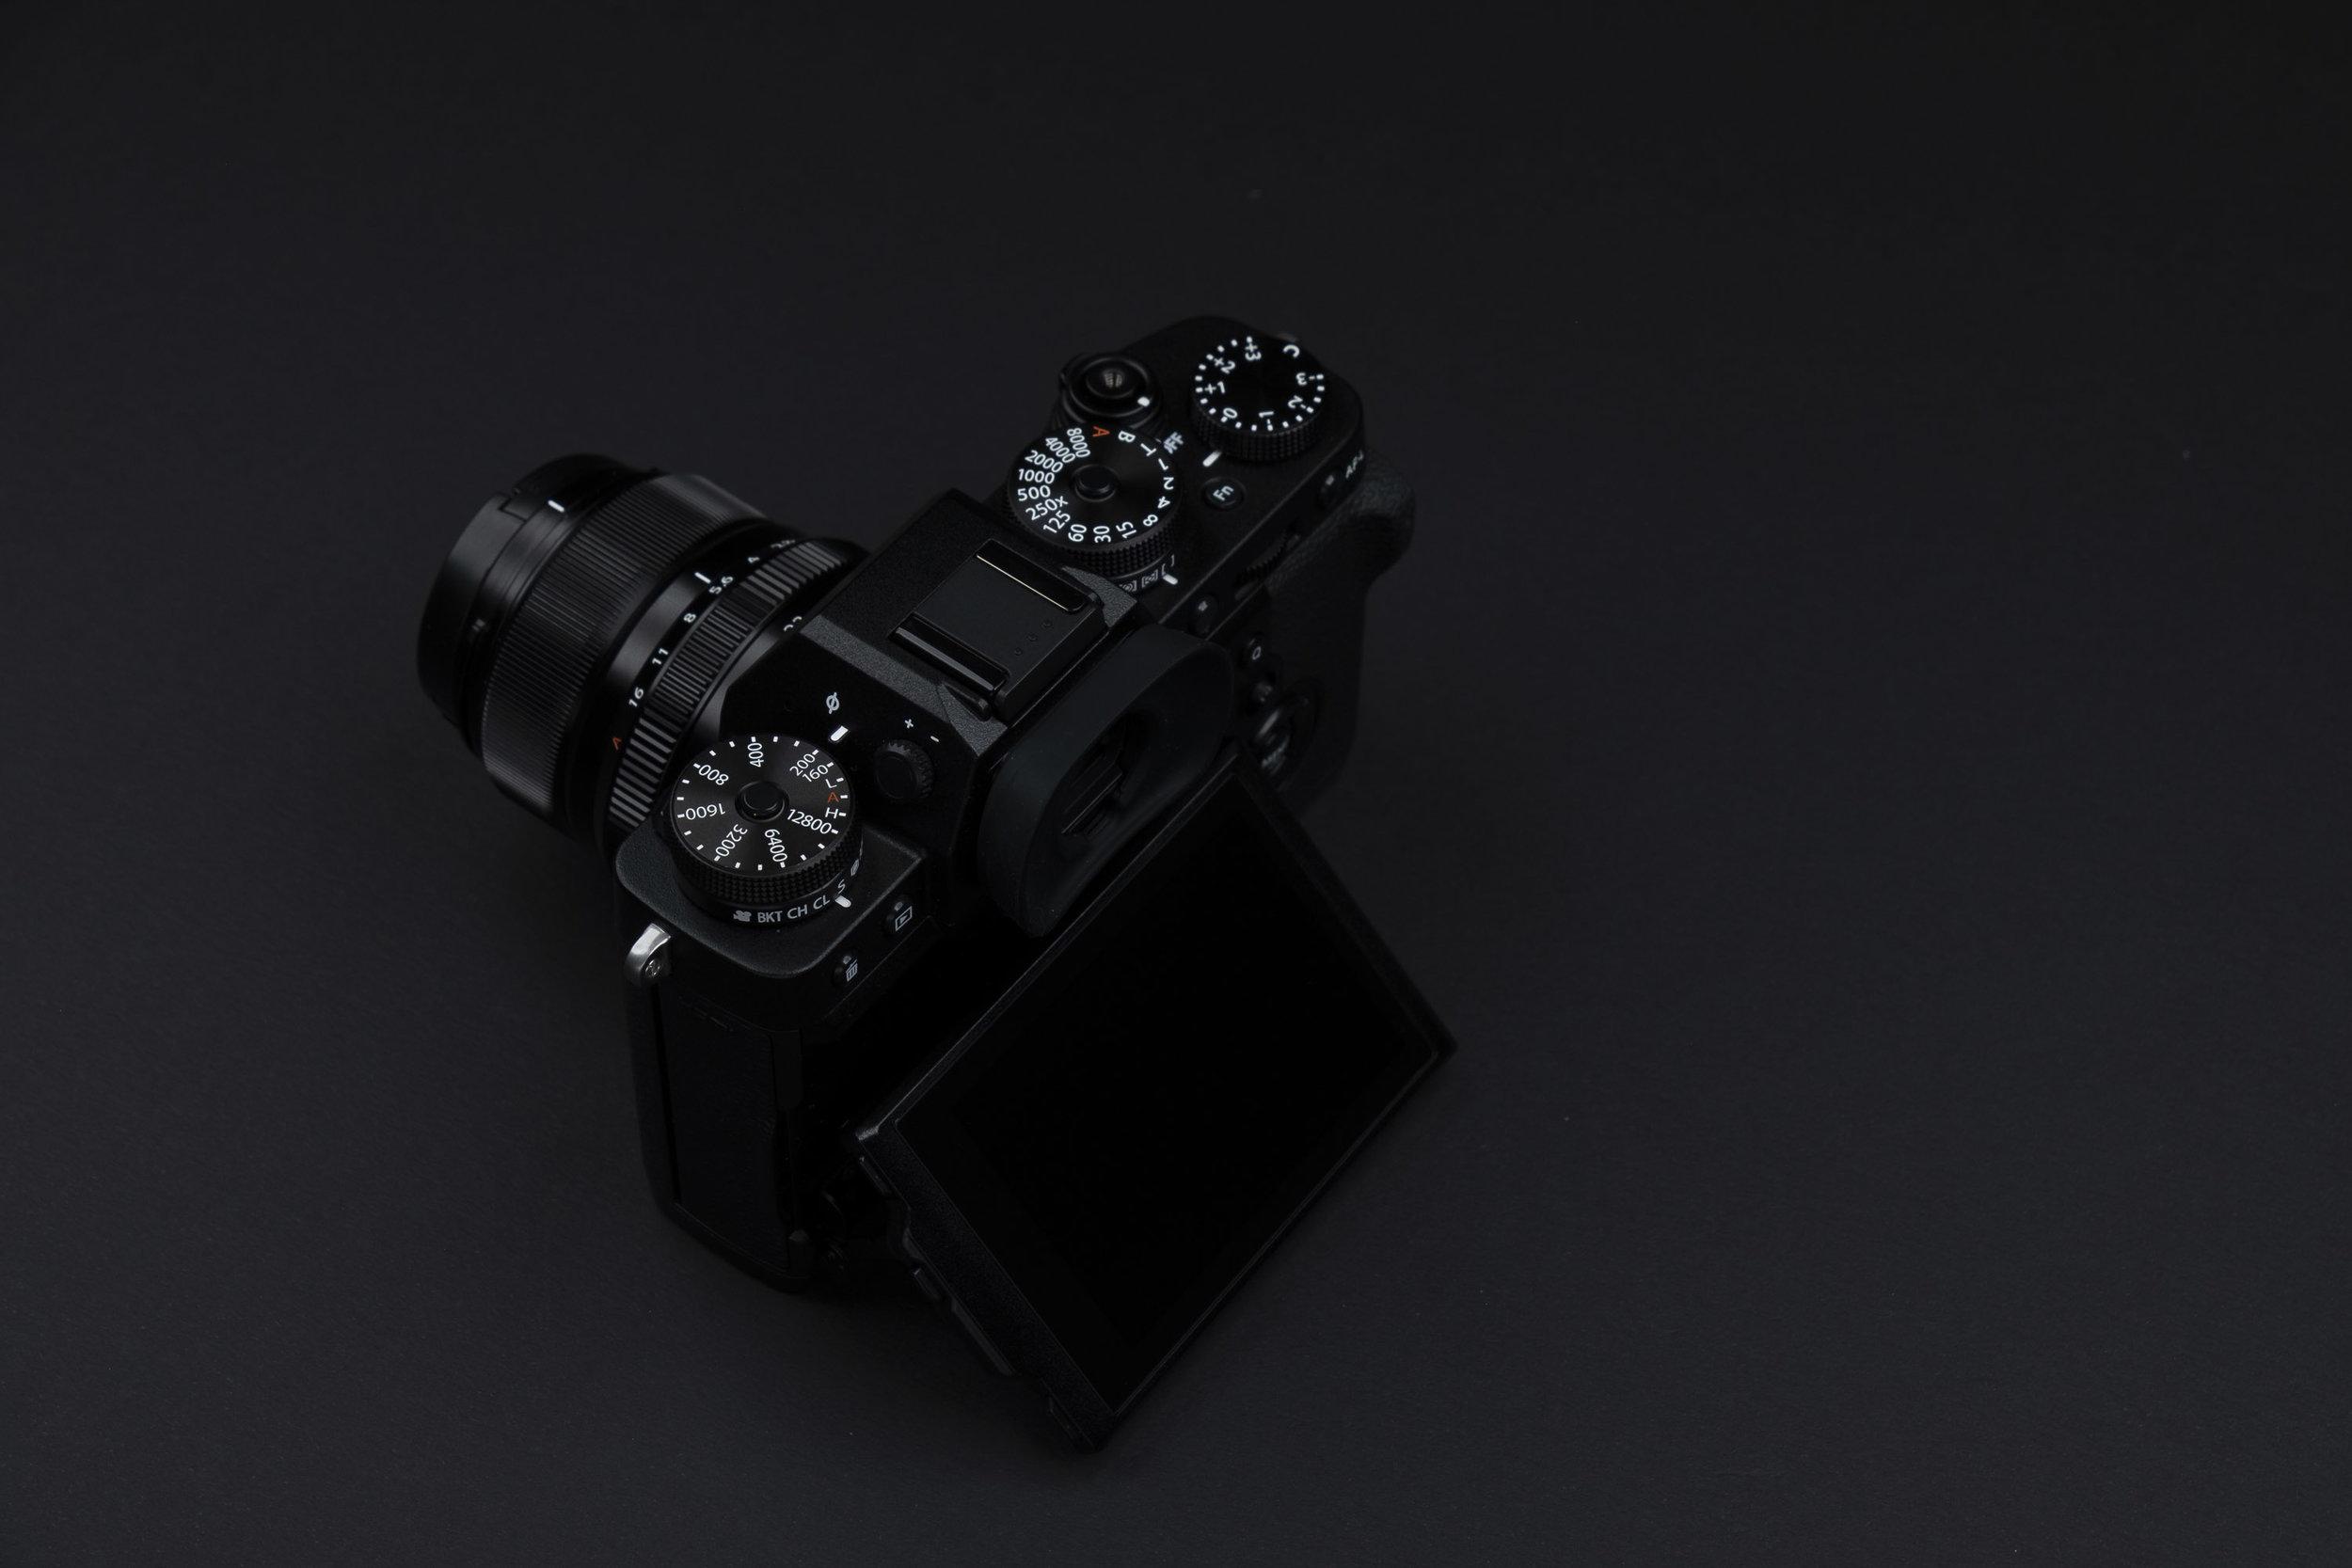 FUJIFILM-X-T3-REVIEW-CAMERA-lr-16.jpg